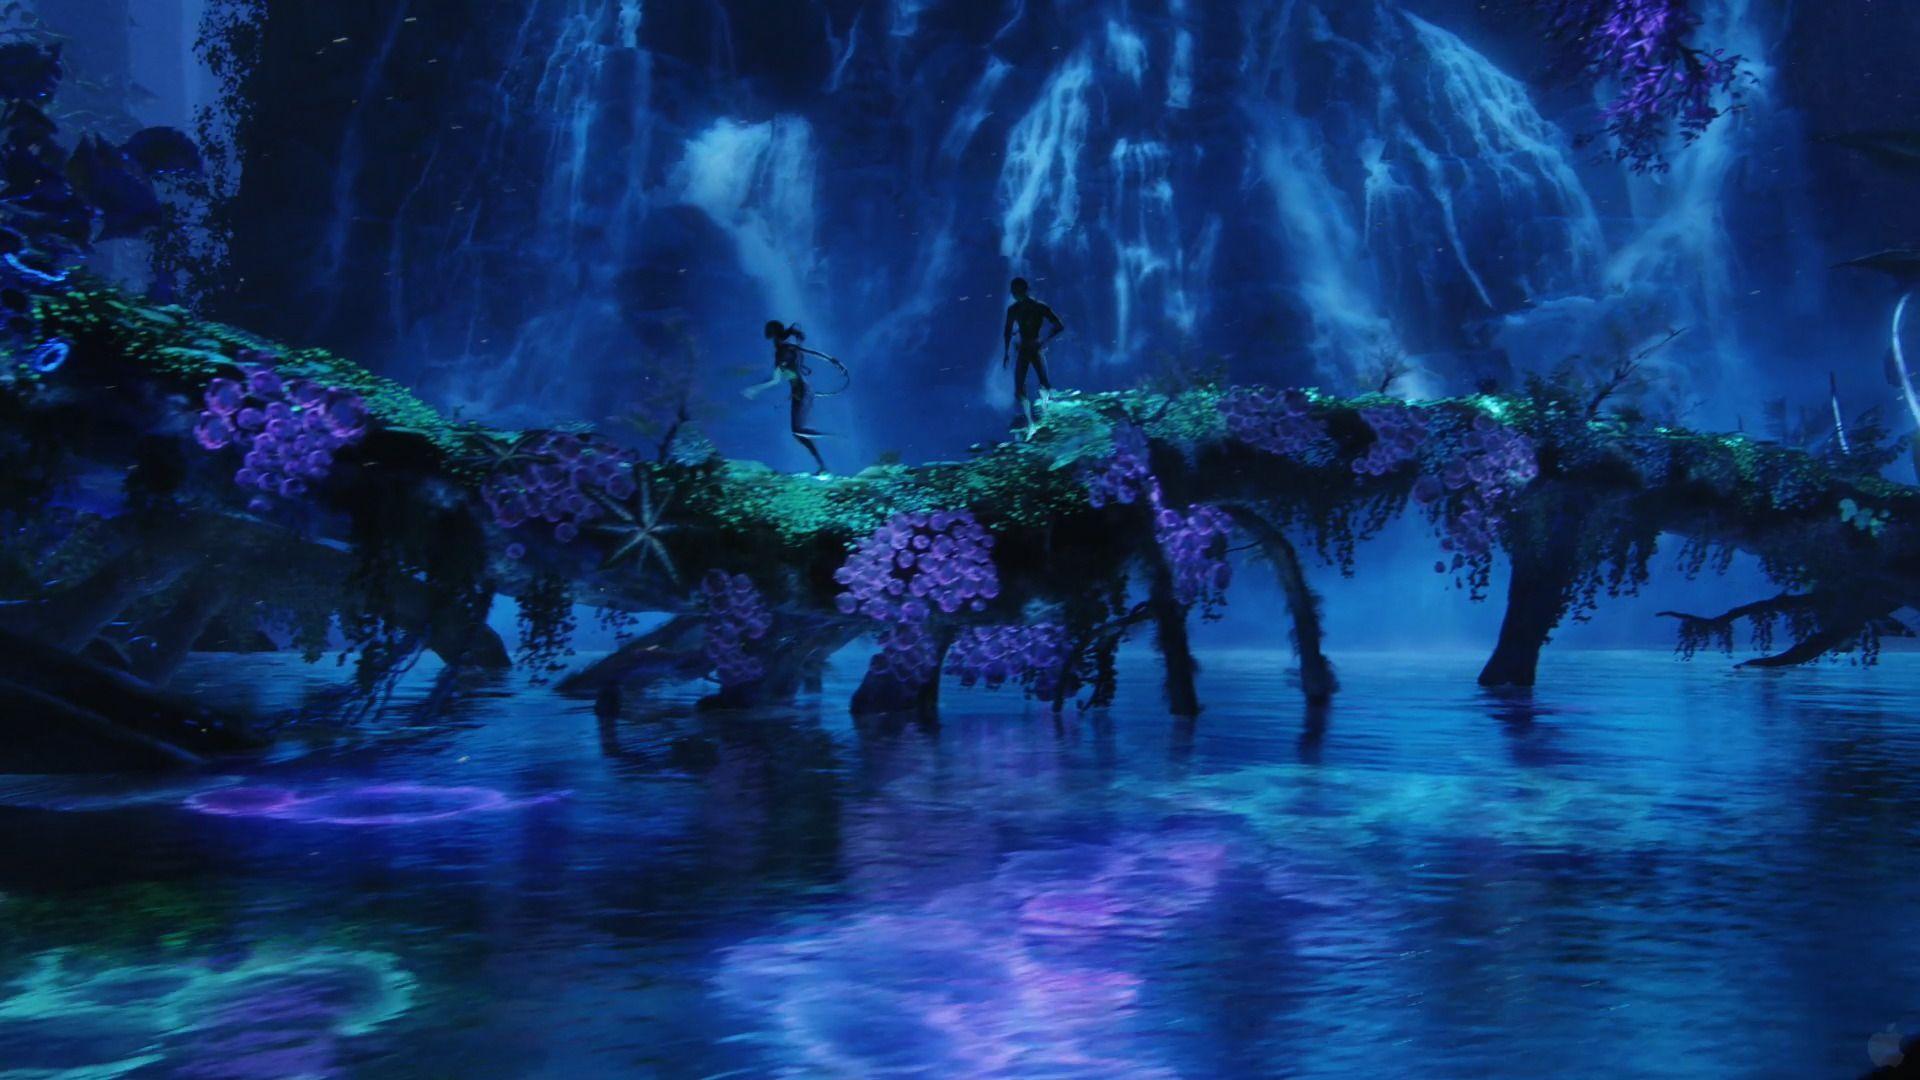 Avatar Backgrounds - Wallpaper Cave